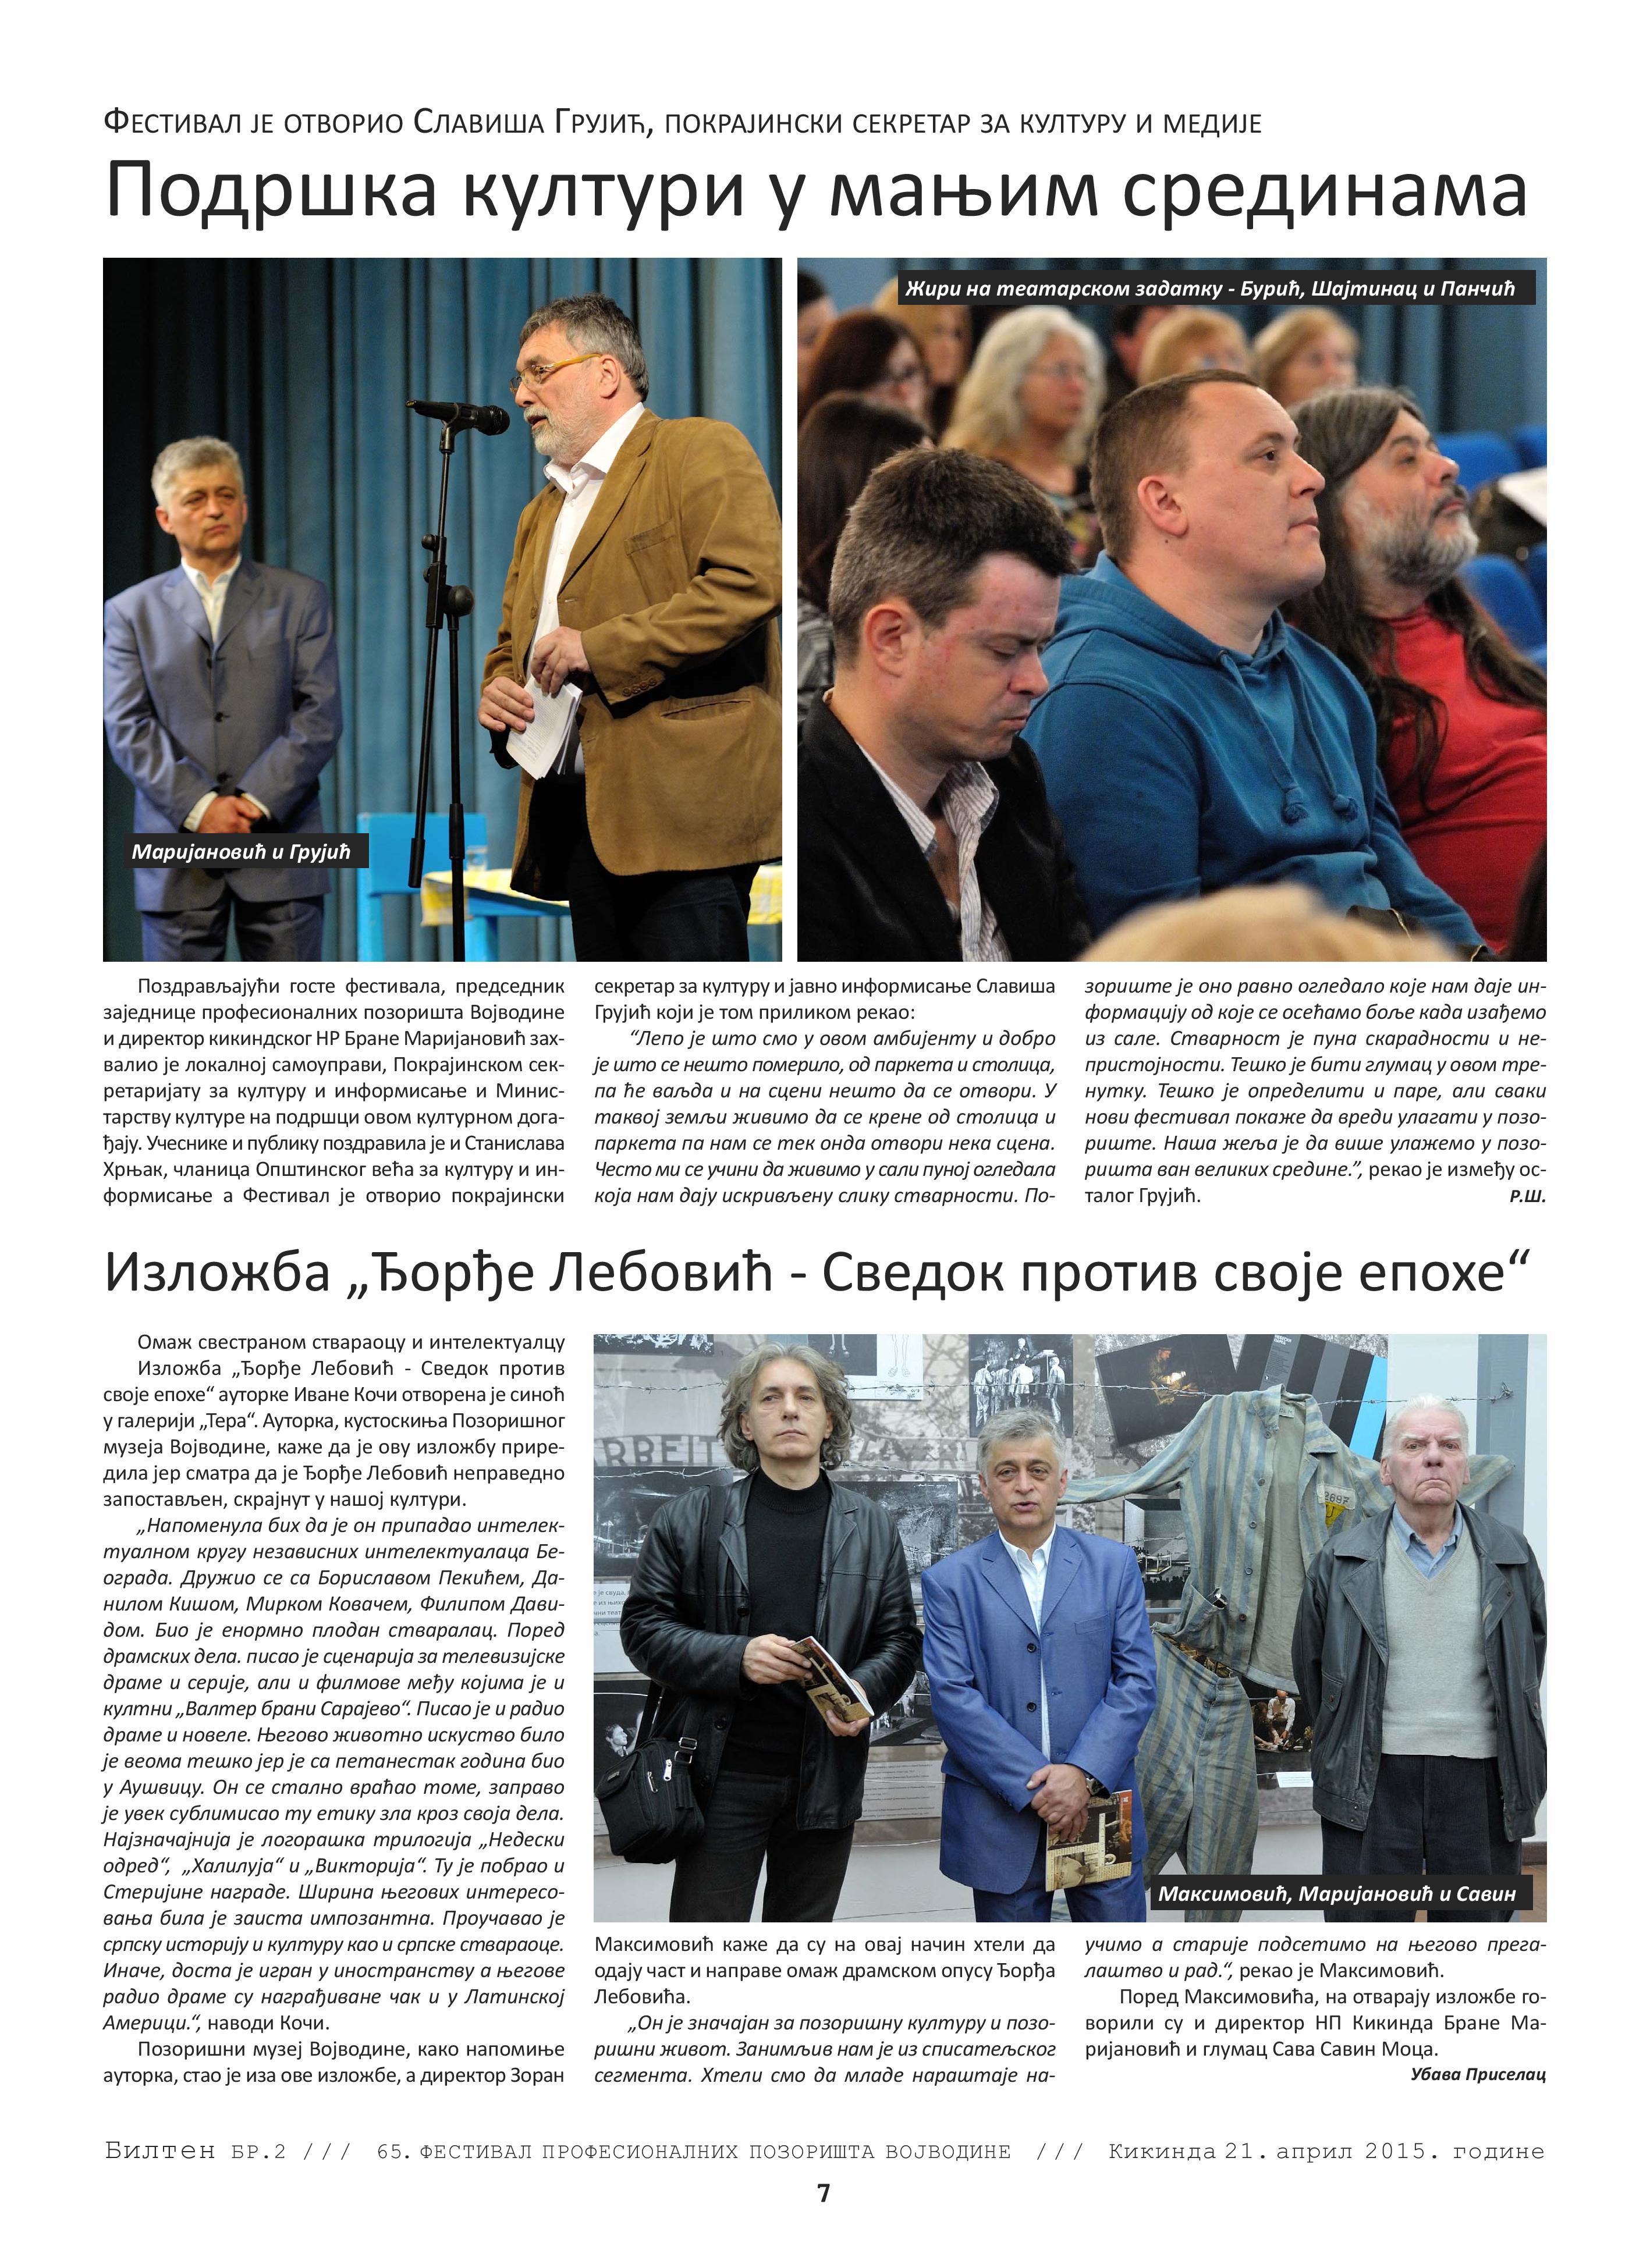 BILTEN_02_21 april-page-007